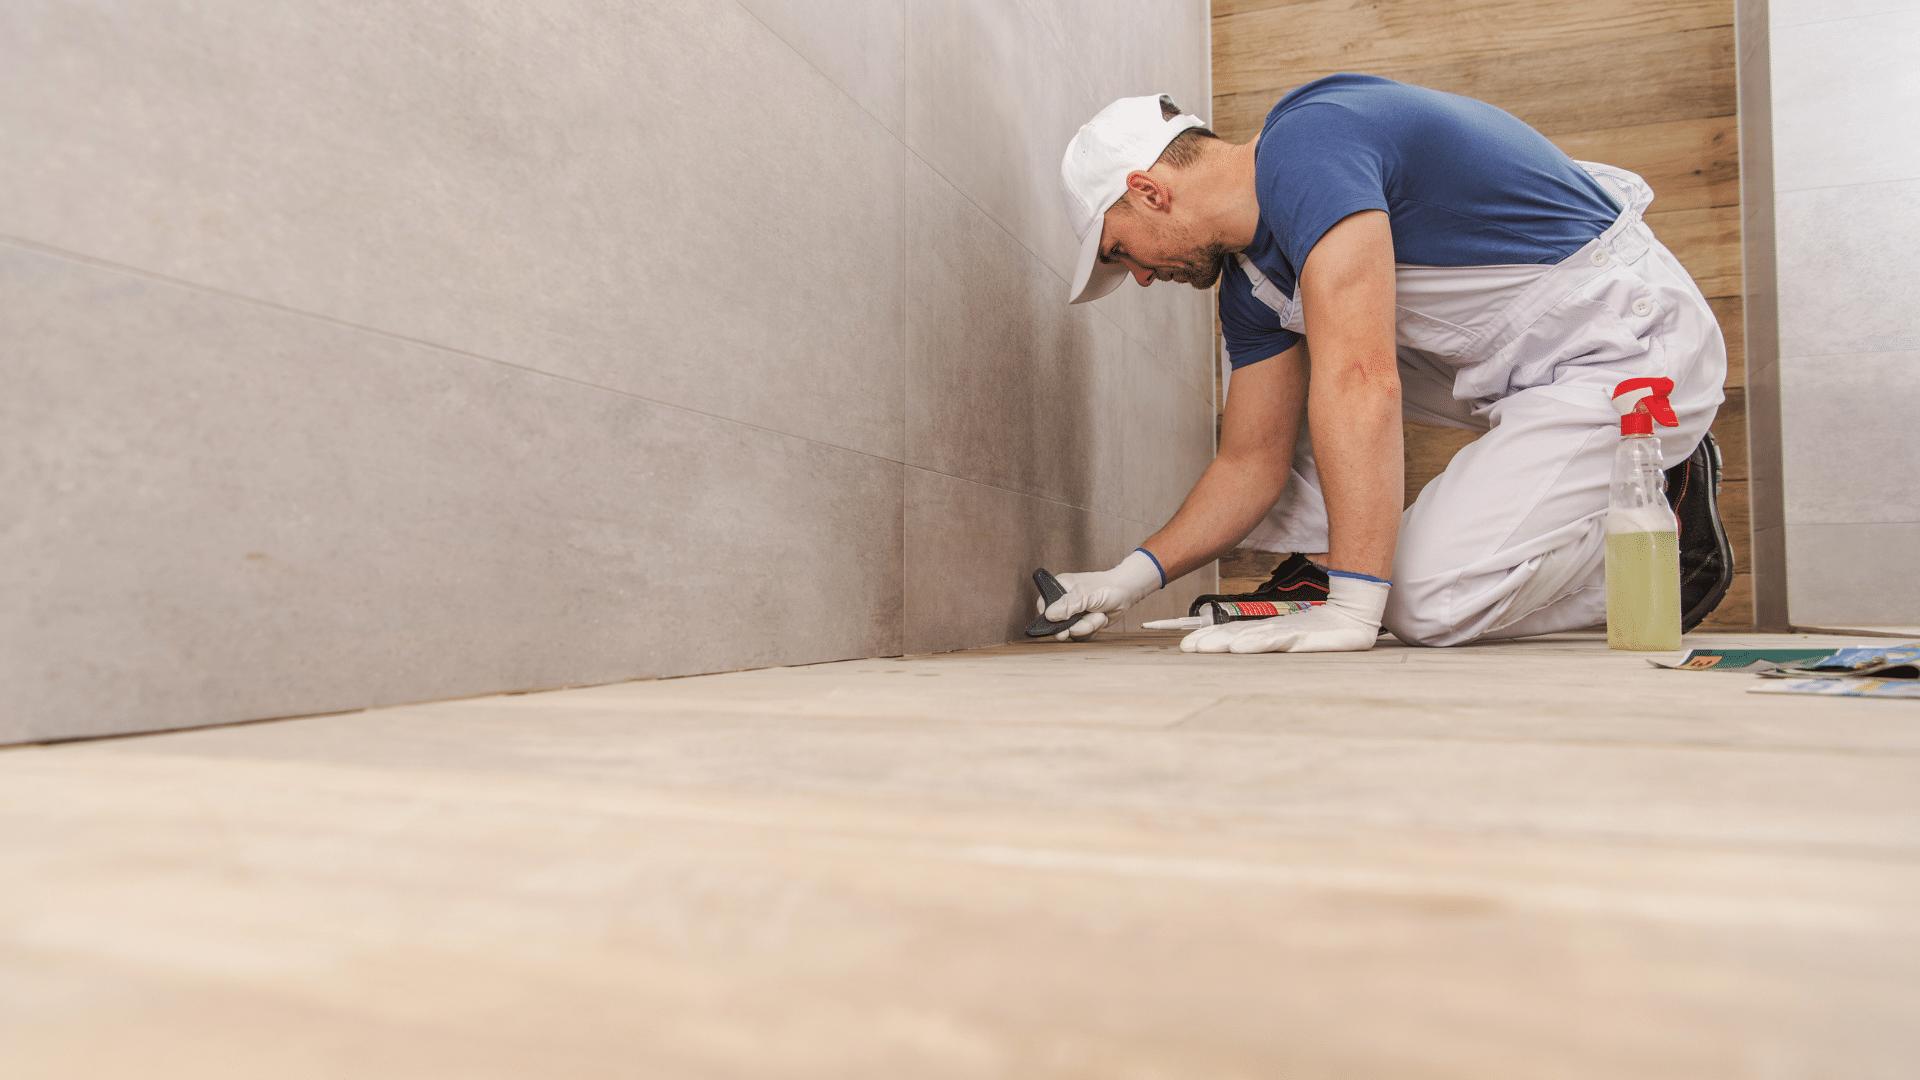 bathroom remodeling contractor installing tile